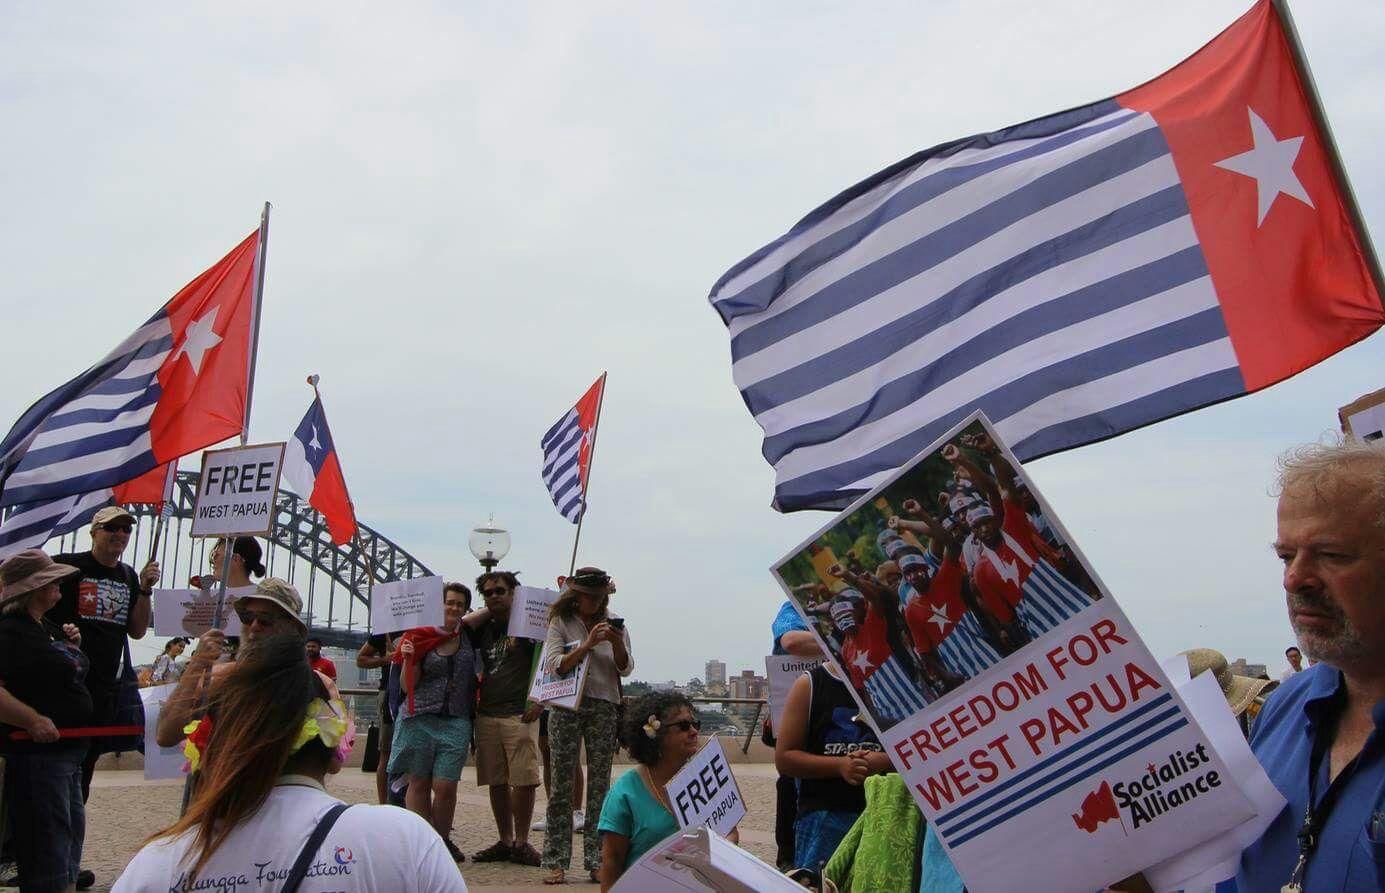 Aksi Long March memperingati HUT Kemerdekaan Papua Barat ke - 55 di Sidney Australia. Socialist Alliance terlibat dalam Aksi ini.@Selai Draunidalo.